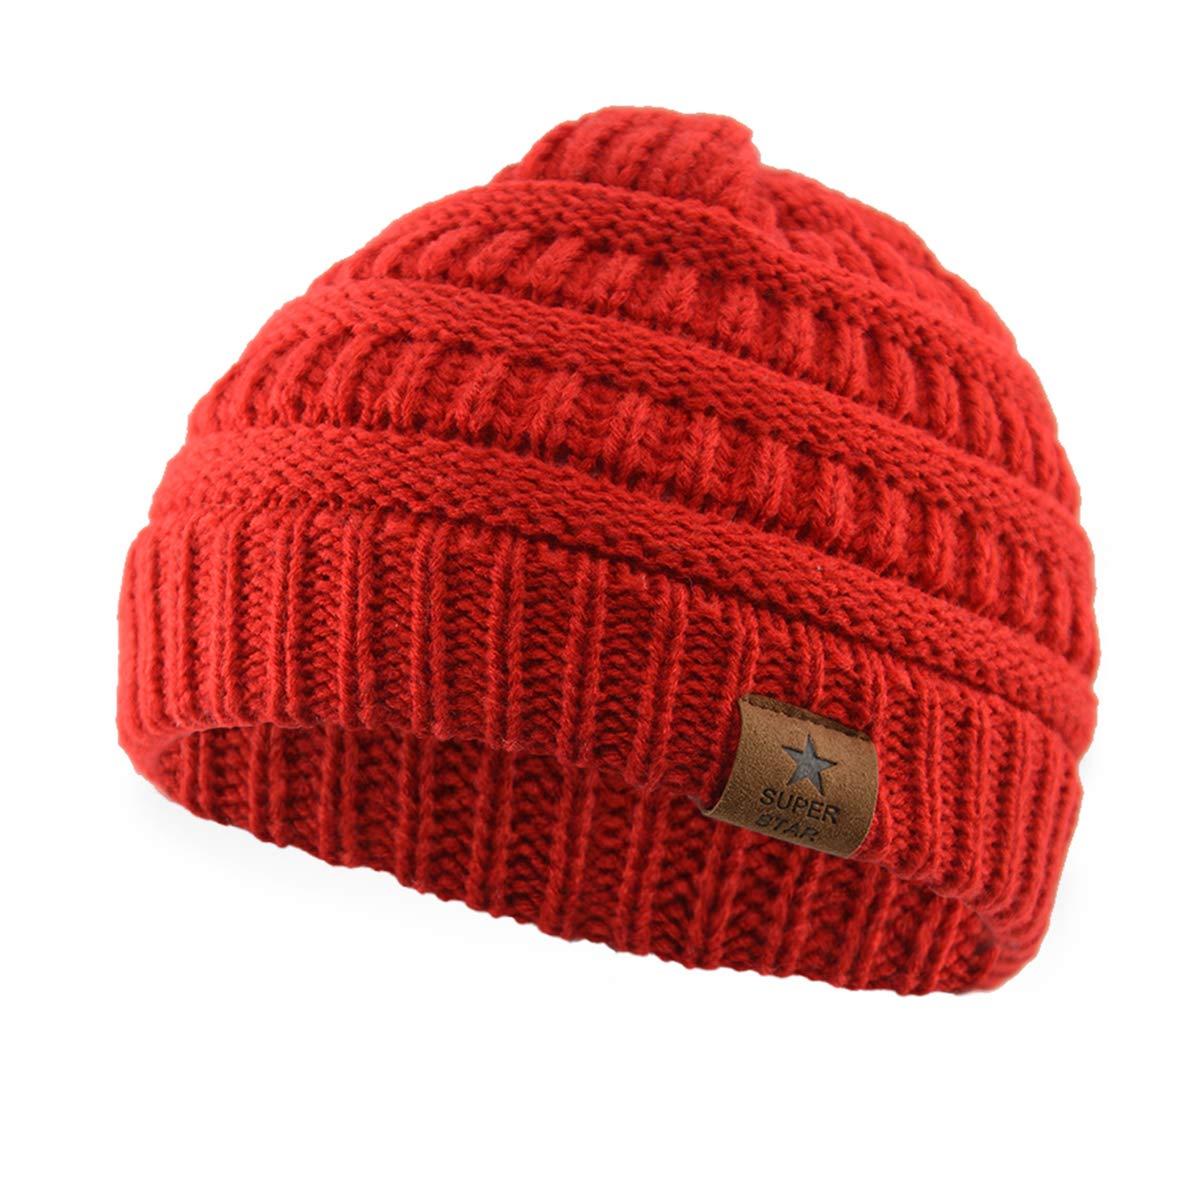 Zando Kids Baby Toddler Ribbed Knit Children Winter Hats Beanies Caps MNFUA1S2580AHA1P